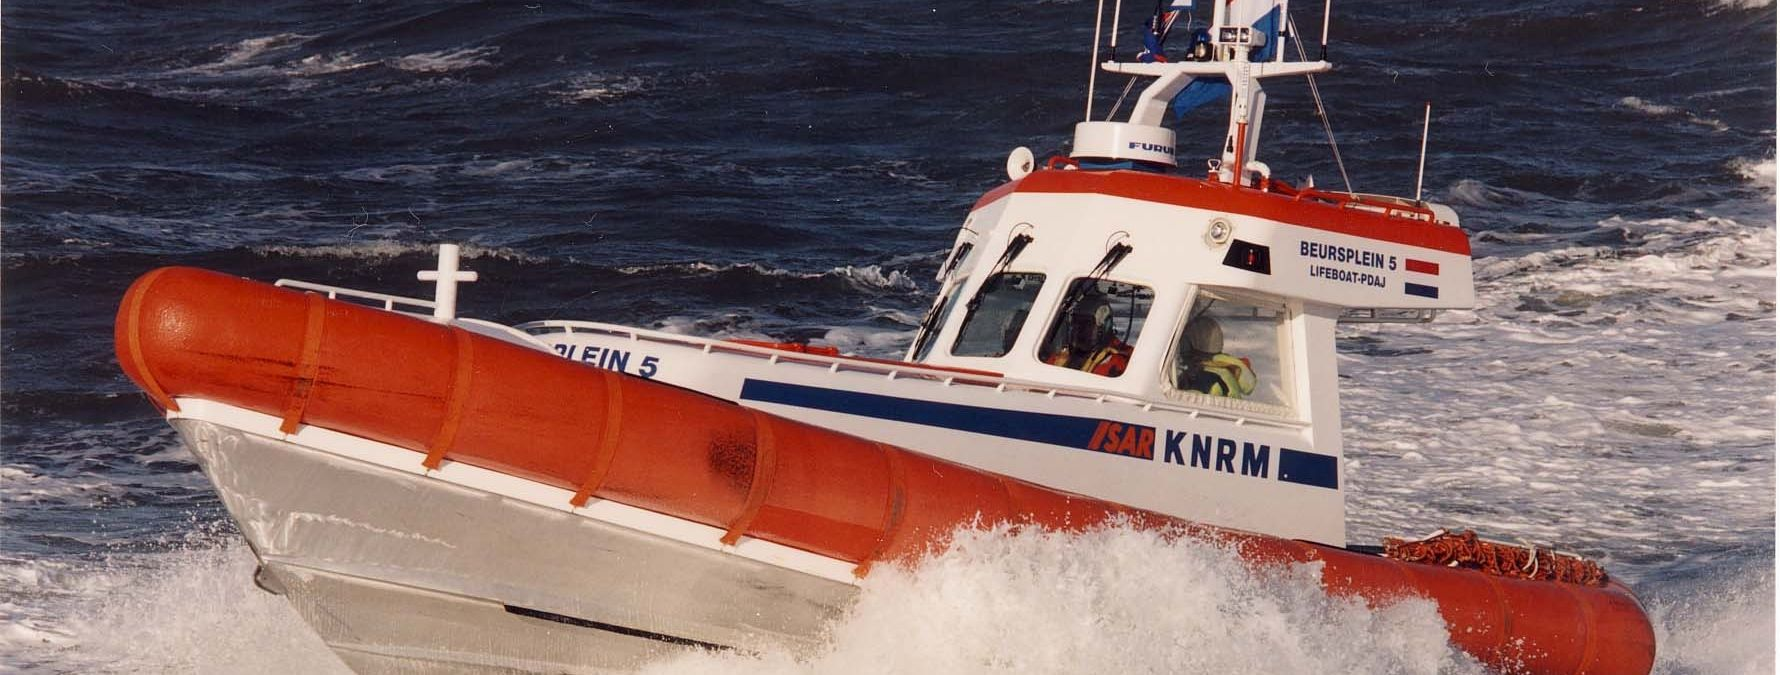 Reddingboot Beursplein 5